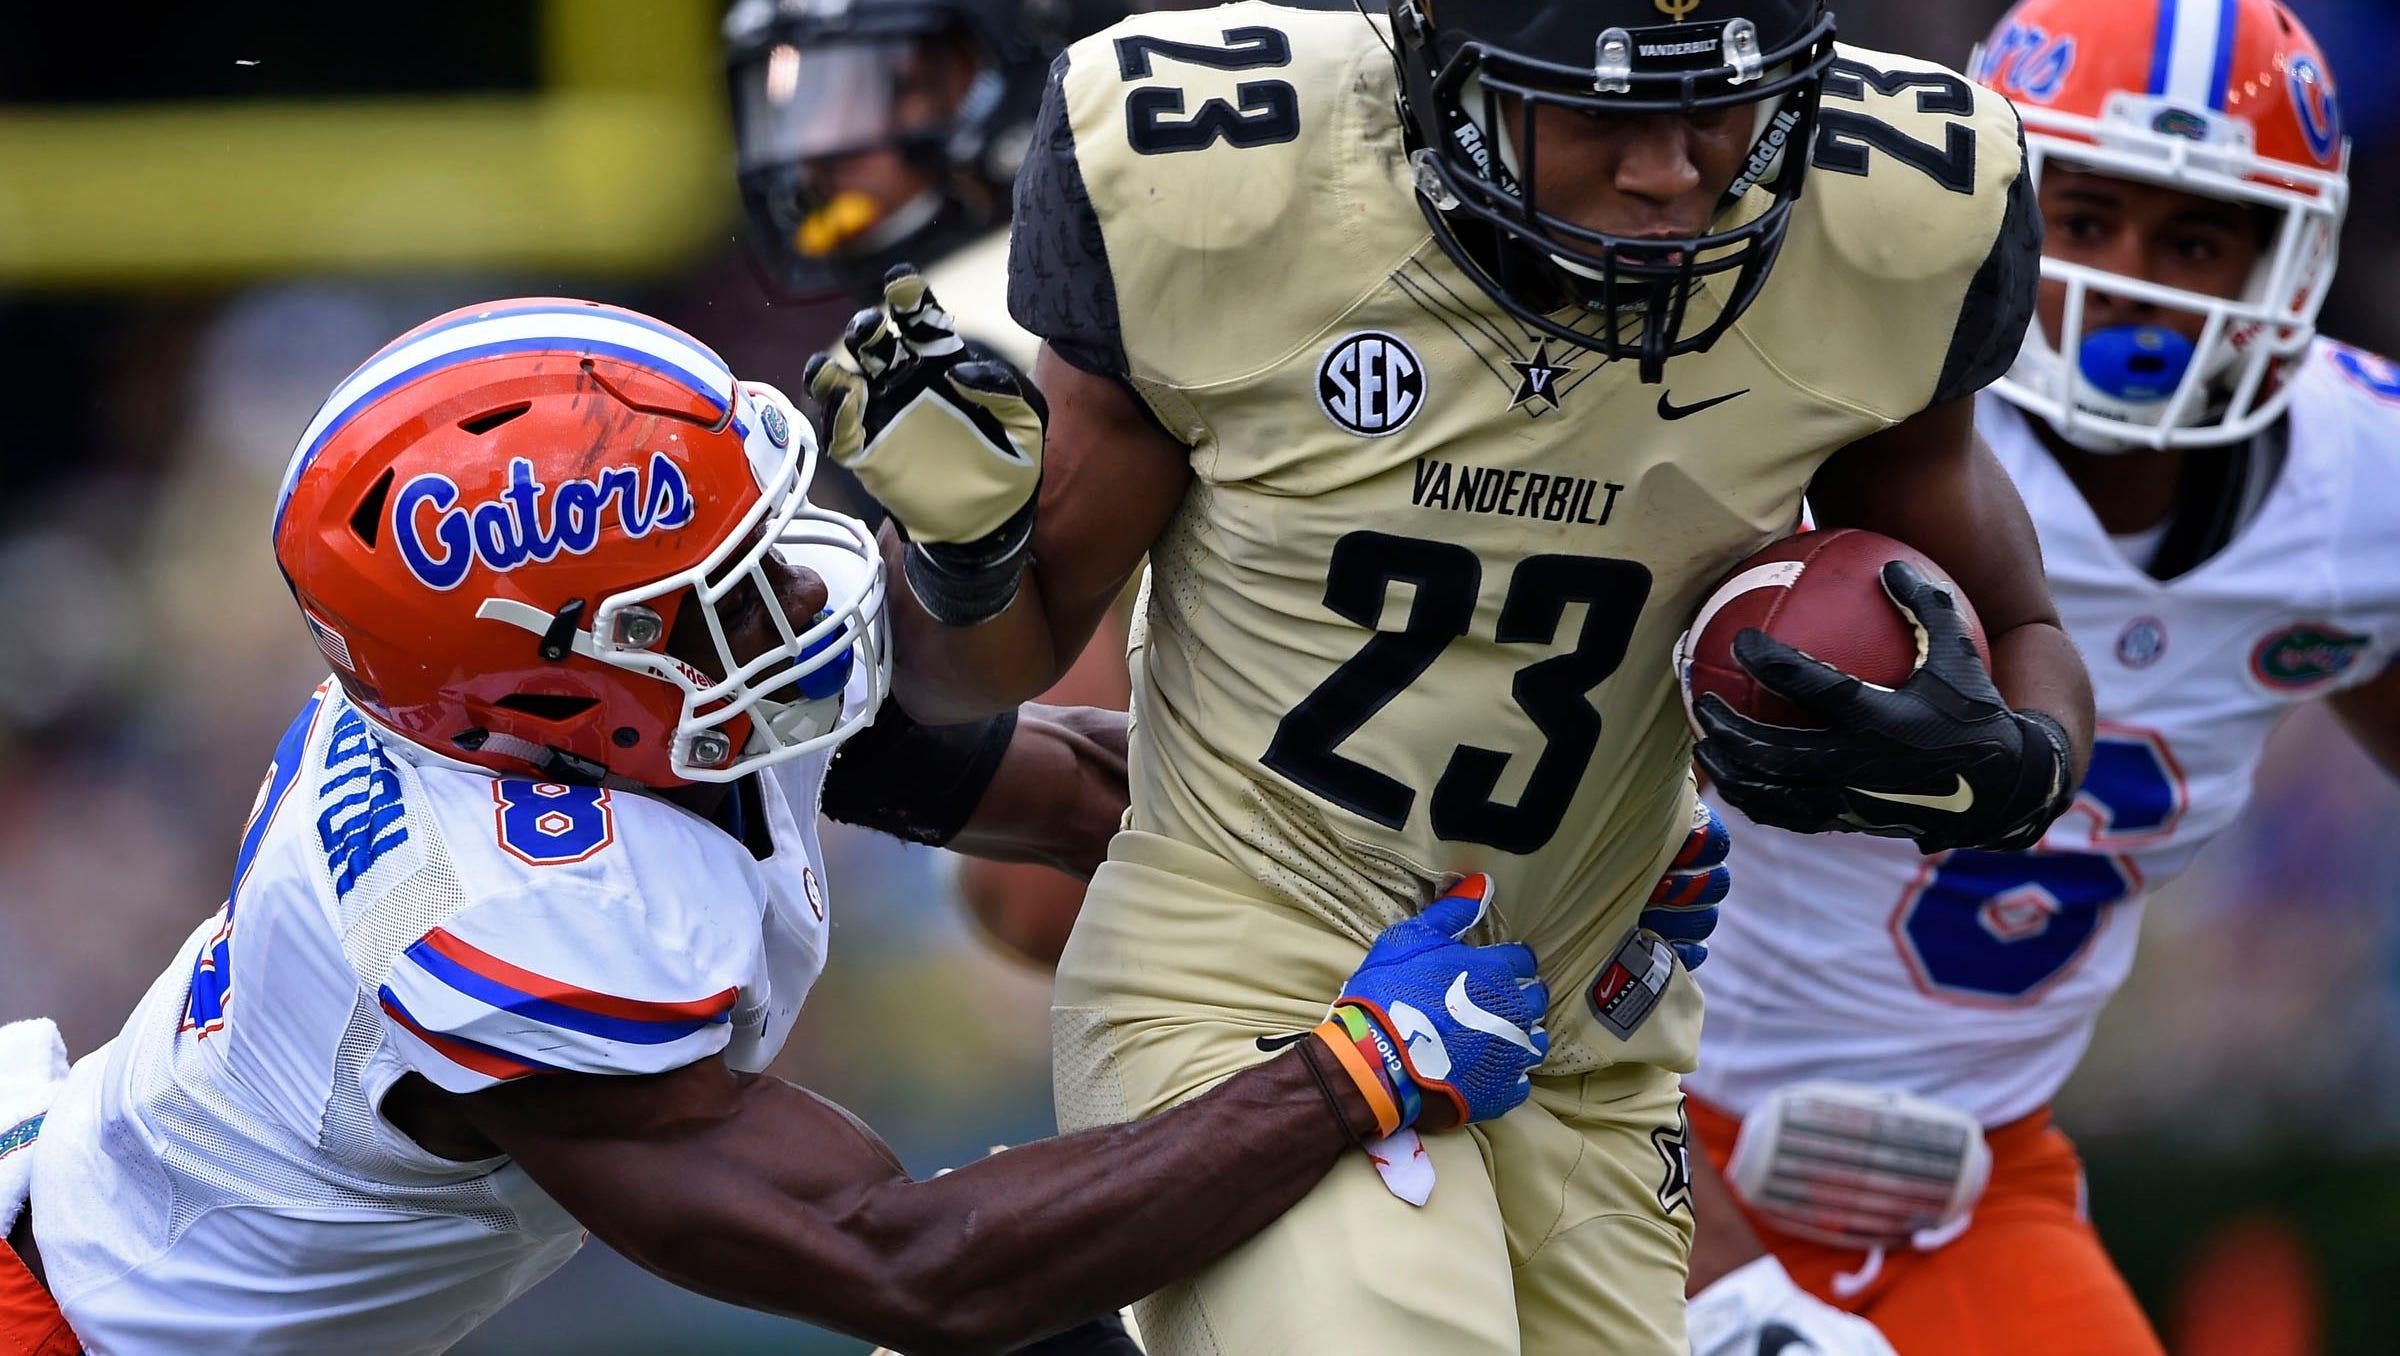 Predictions Will Vanderbilt Sink At The Swamp Vs Florida We re Not So Sure